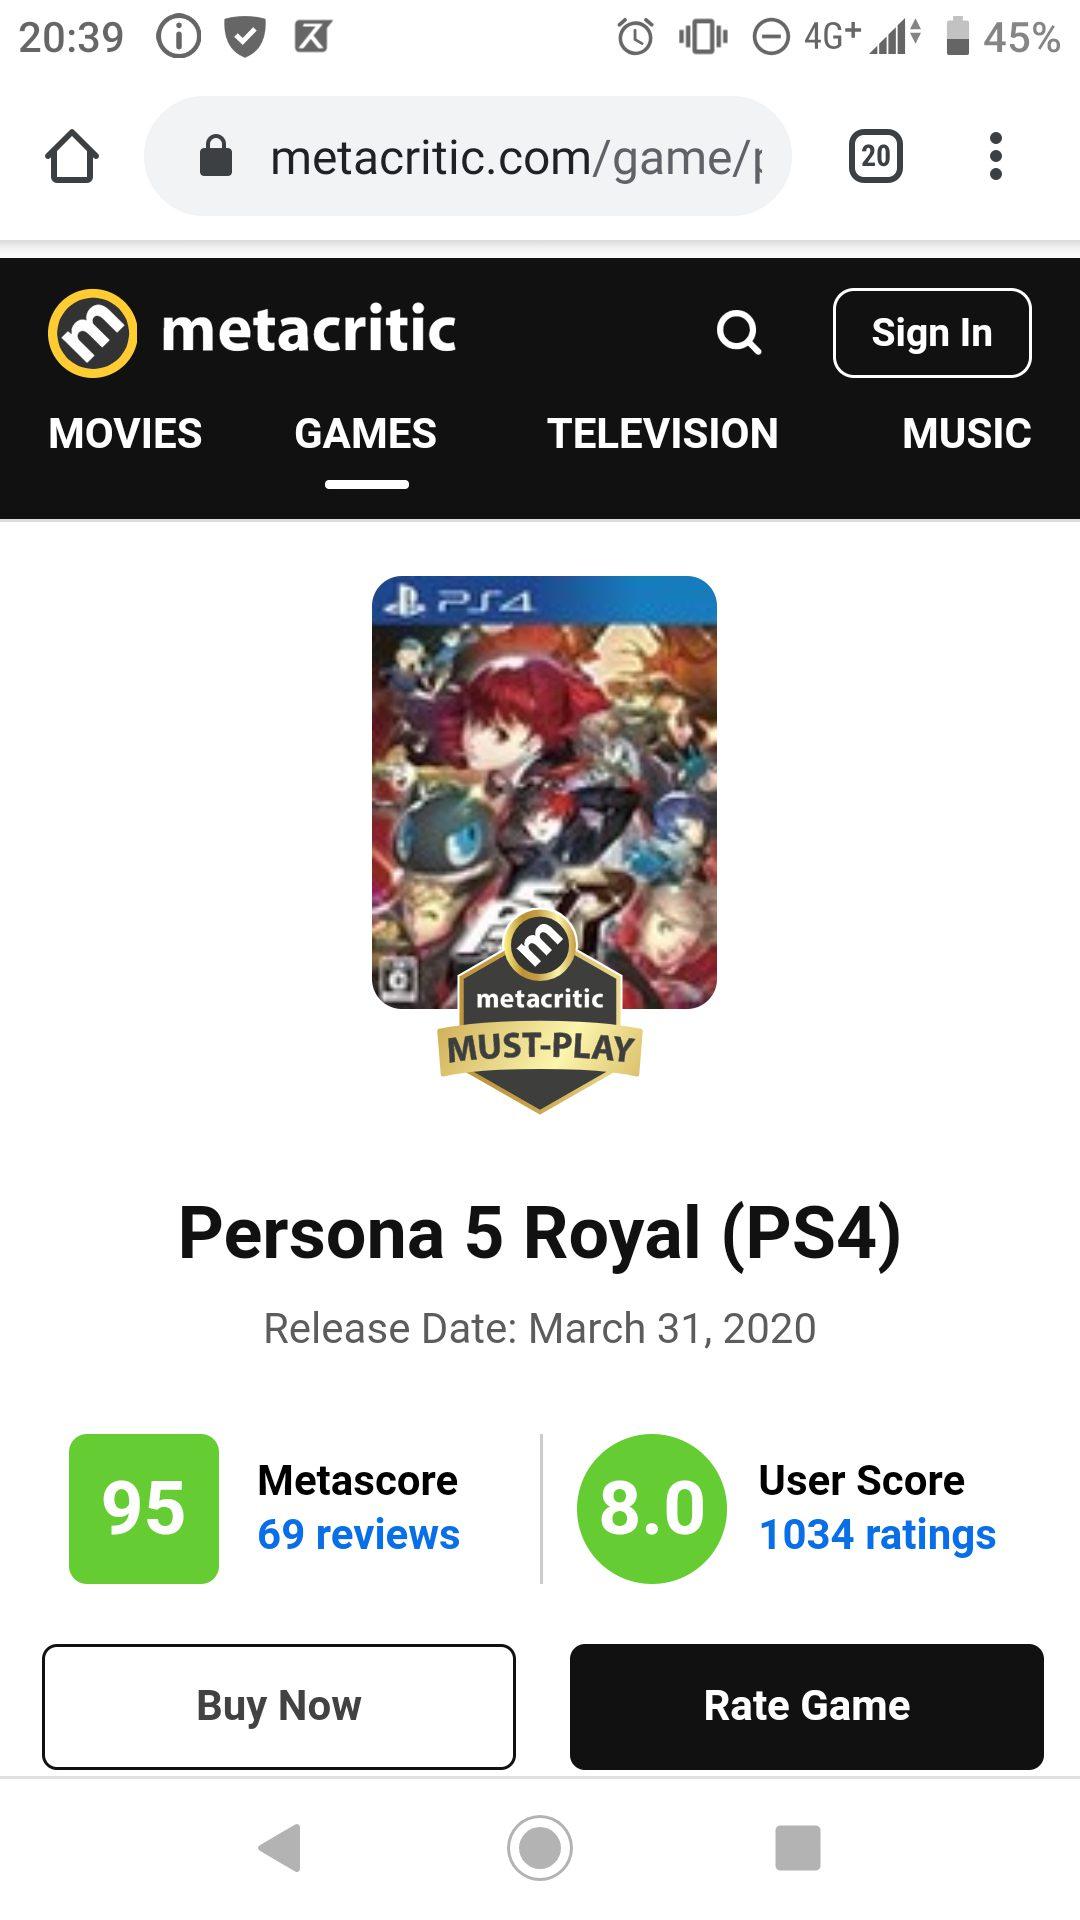 ypjELJq - セガ「ペルソナ5ザ・ロイヤルが欧米で記録的な売上を達成した」